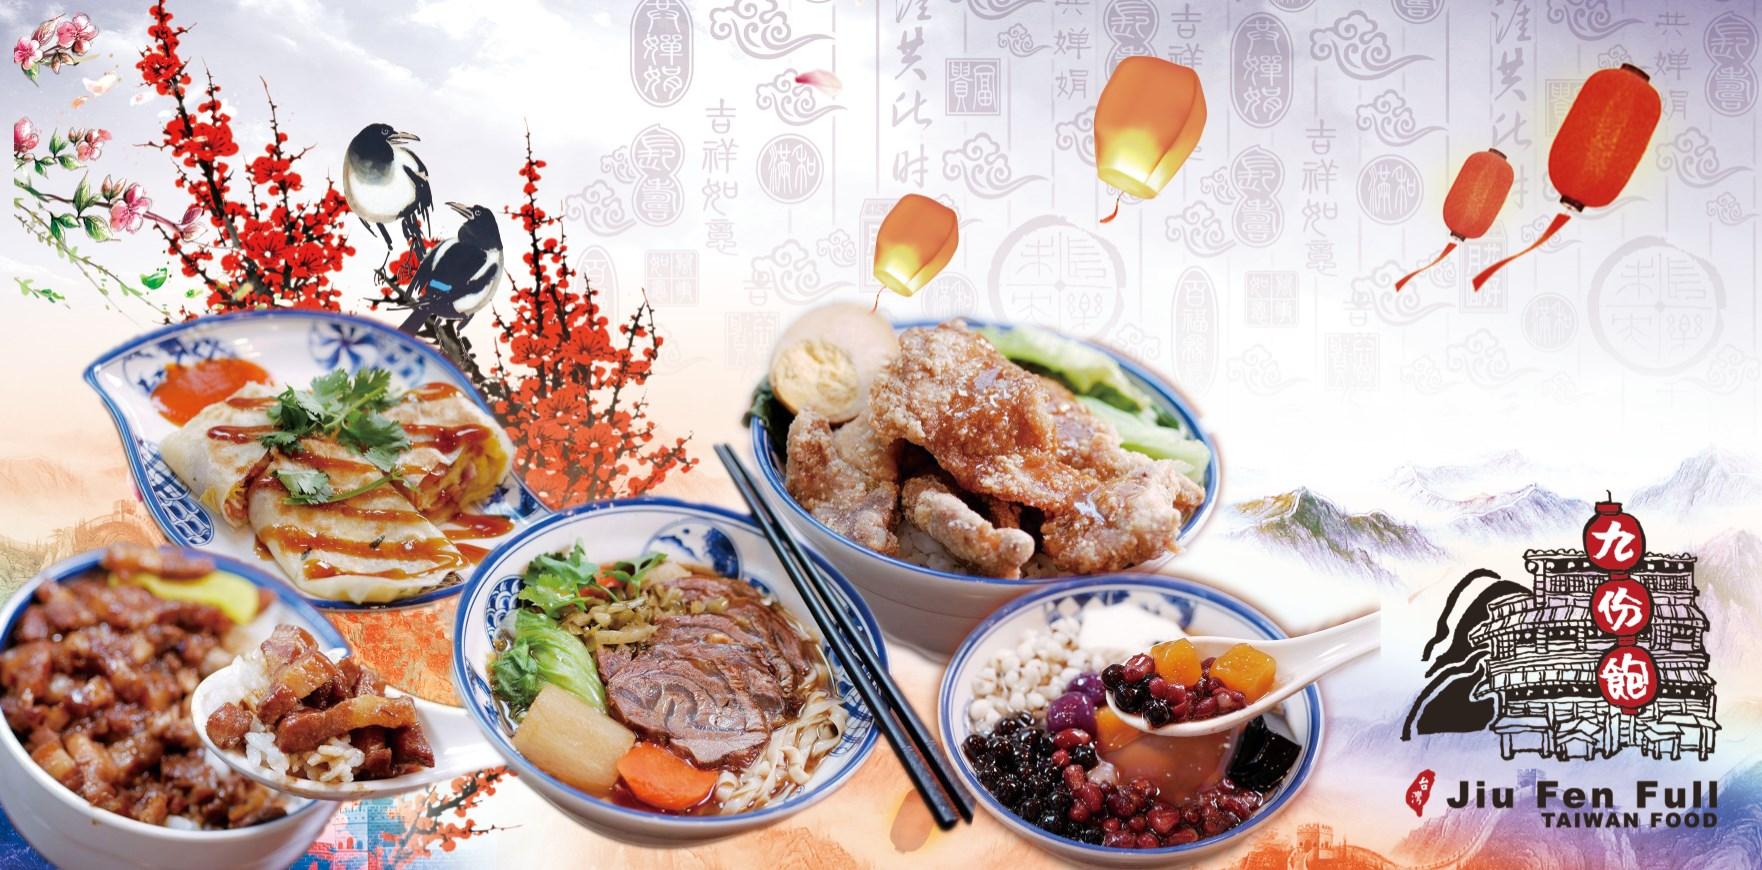 Jiu Fen Full